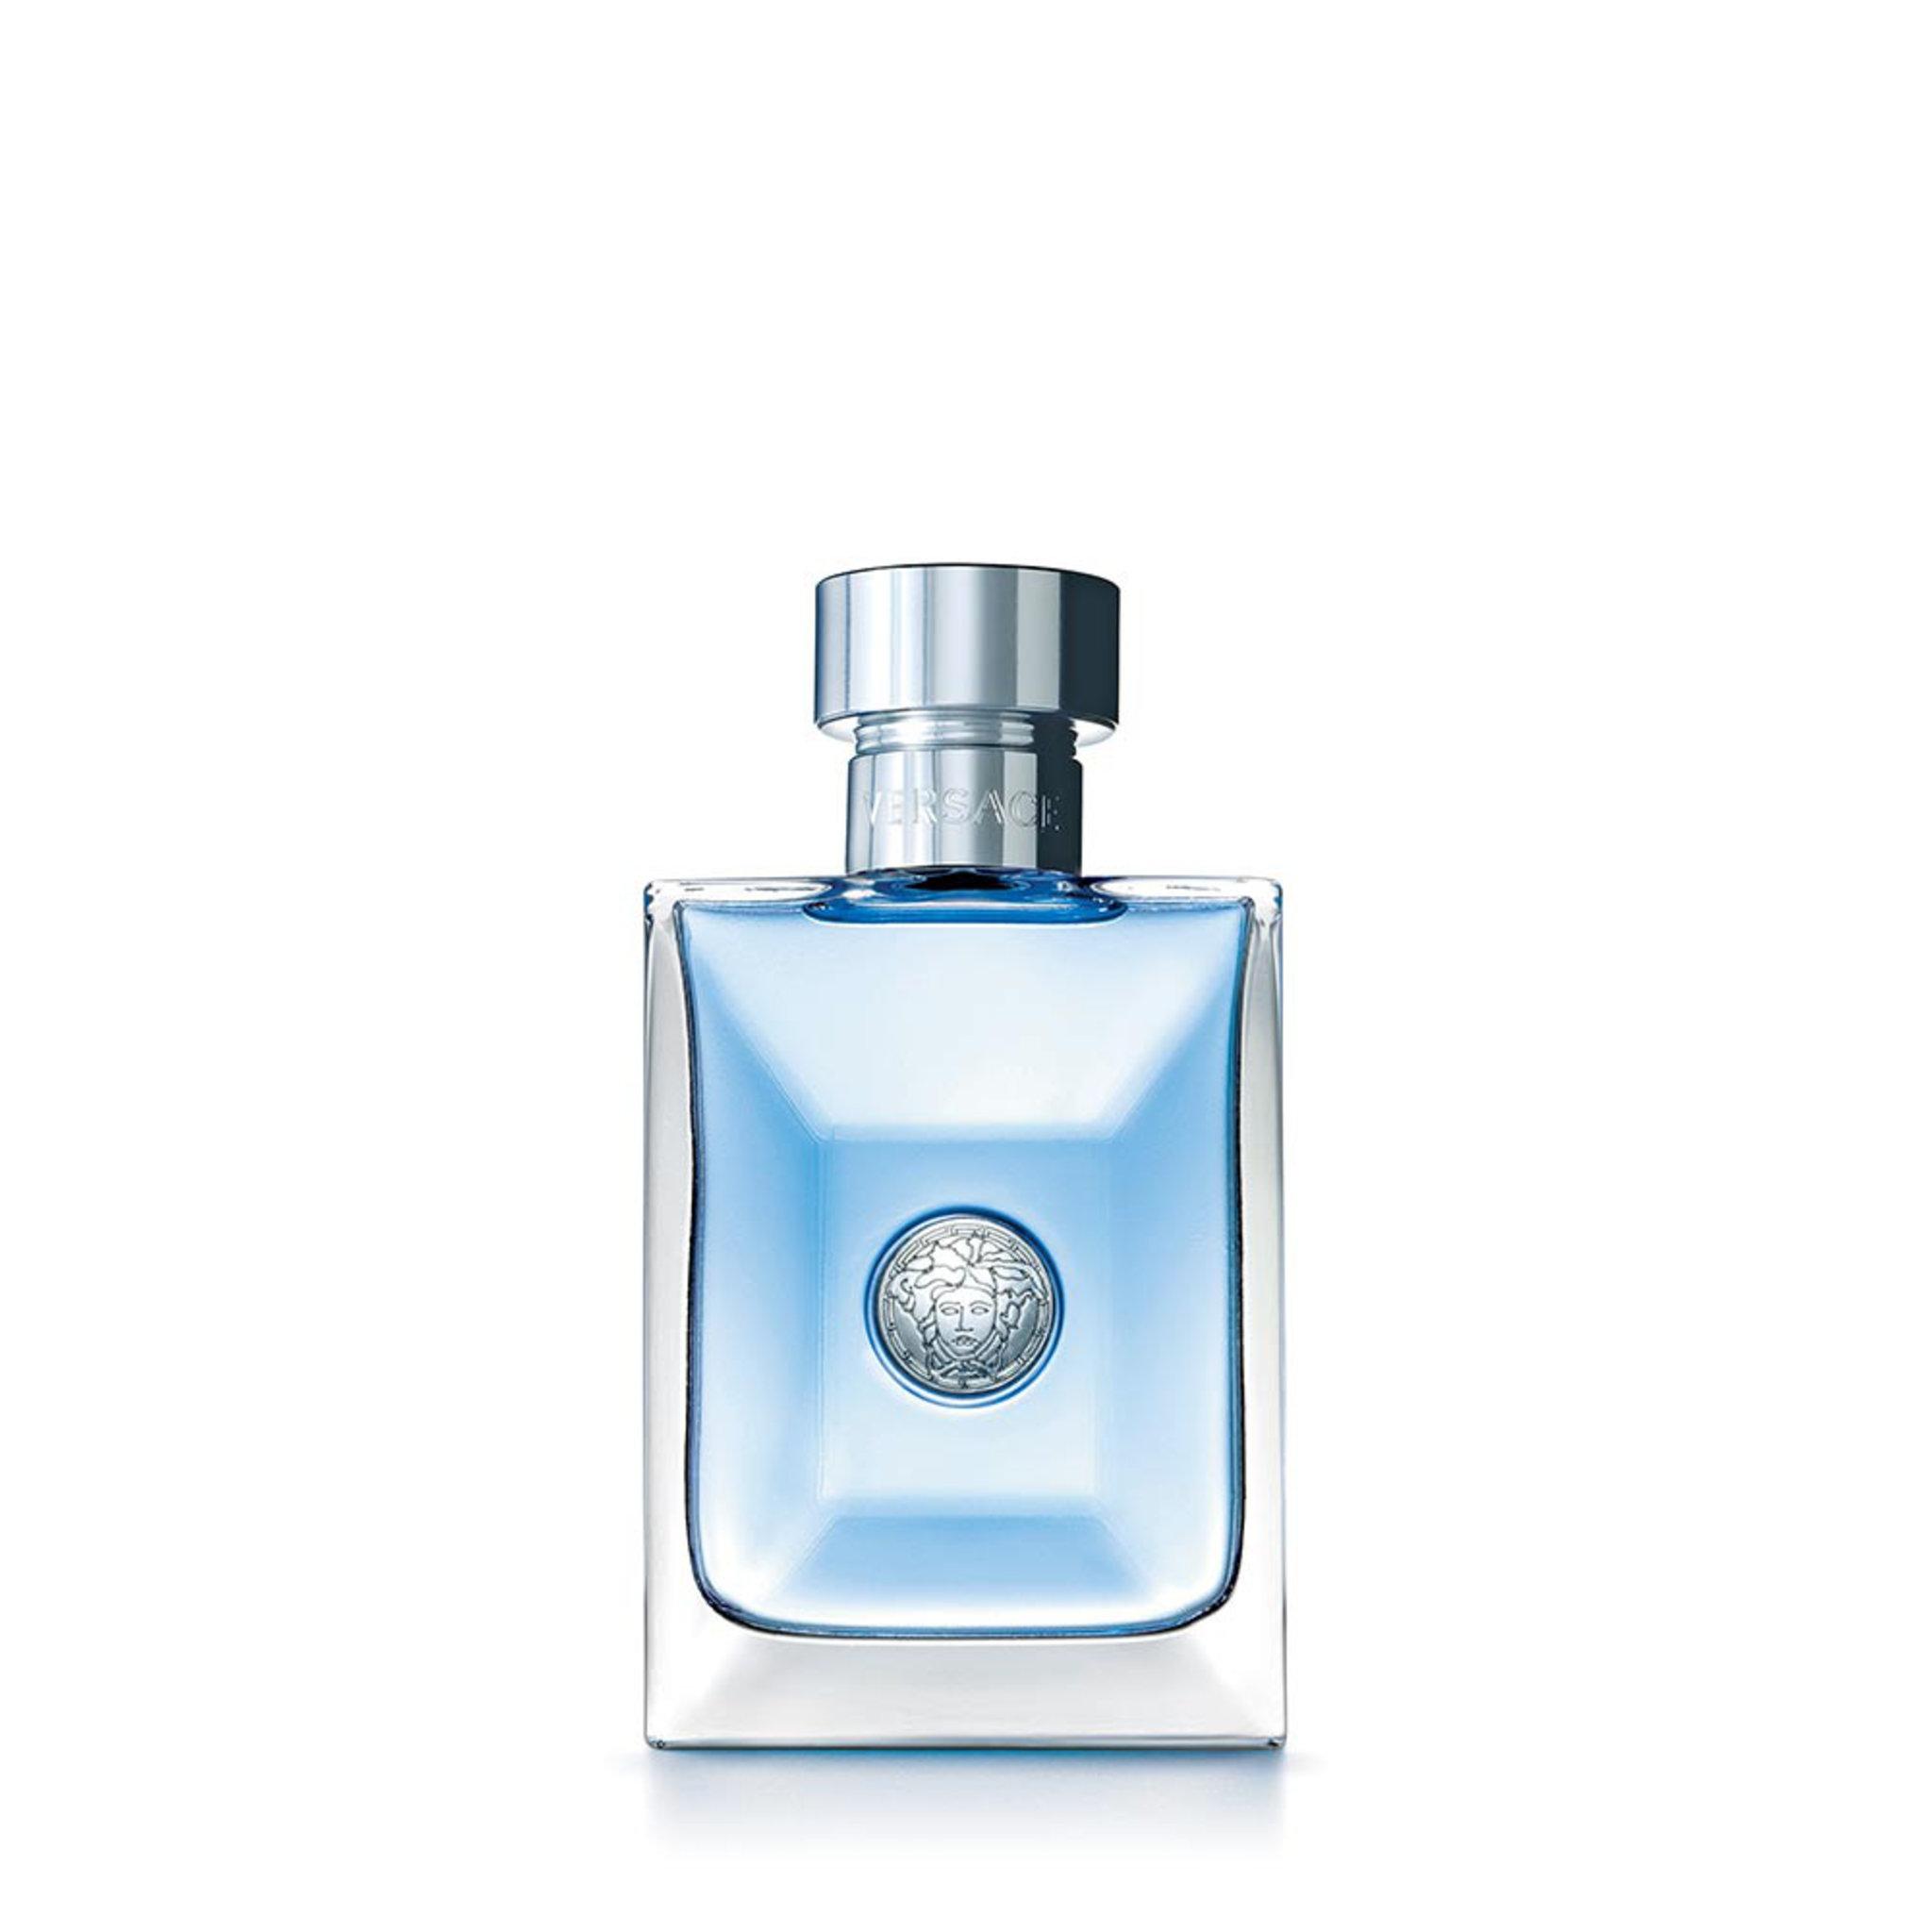 Pour Homme After Shave Splash, 100 ml, 100 ML